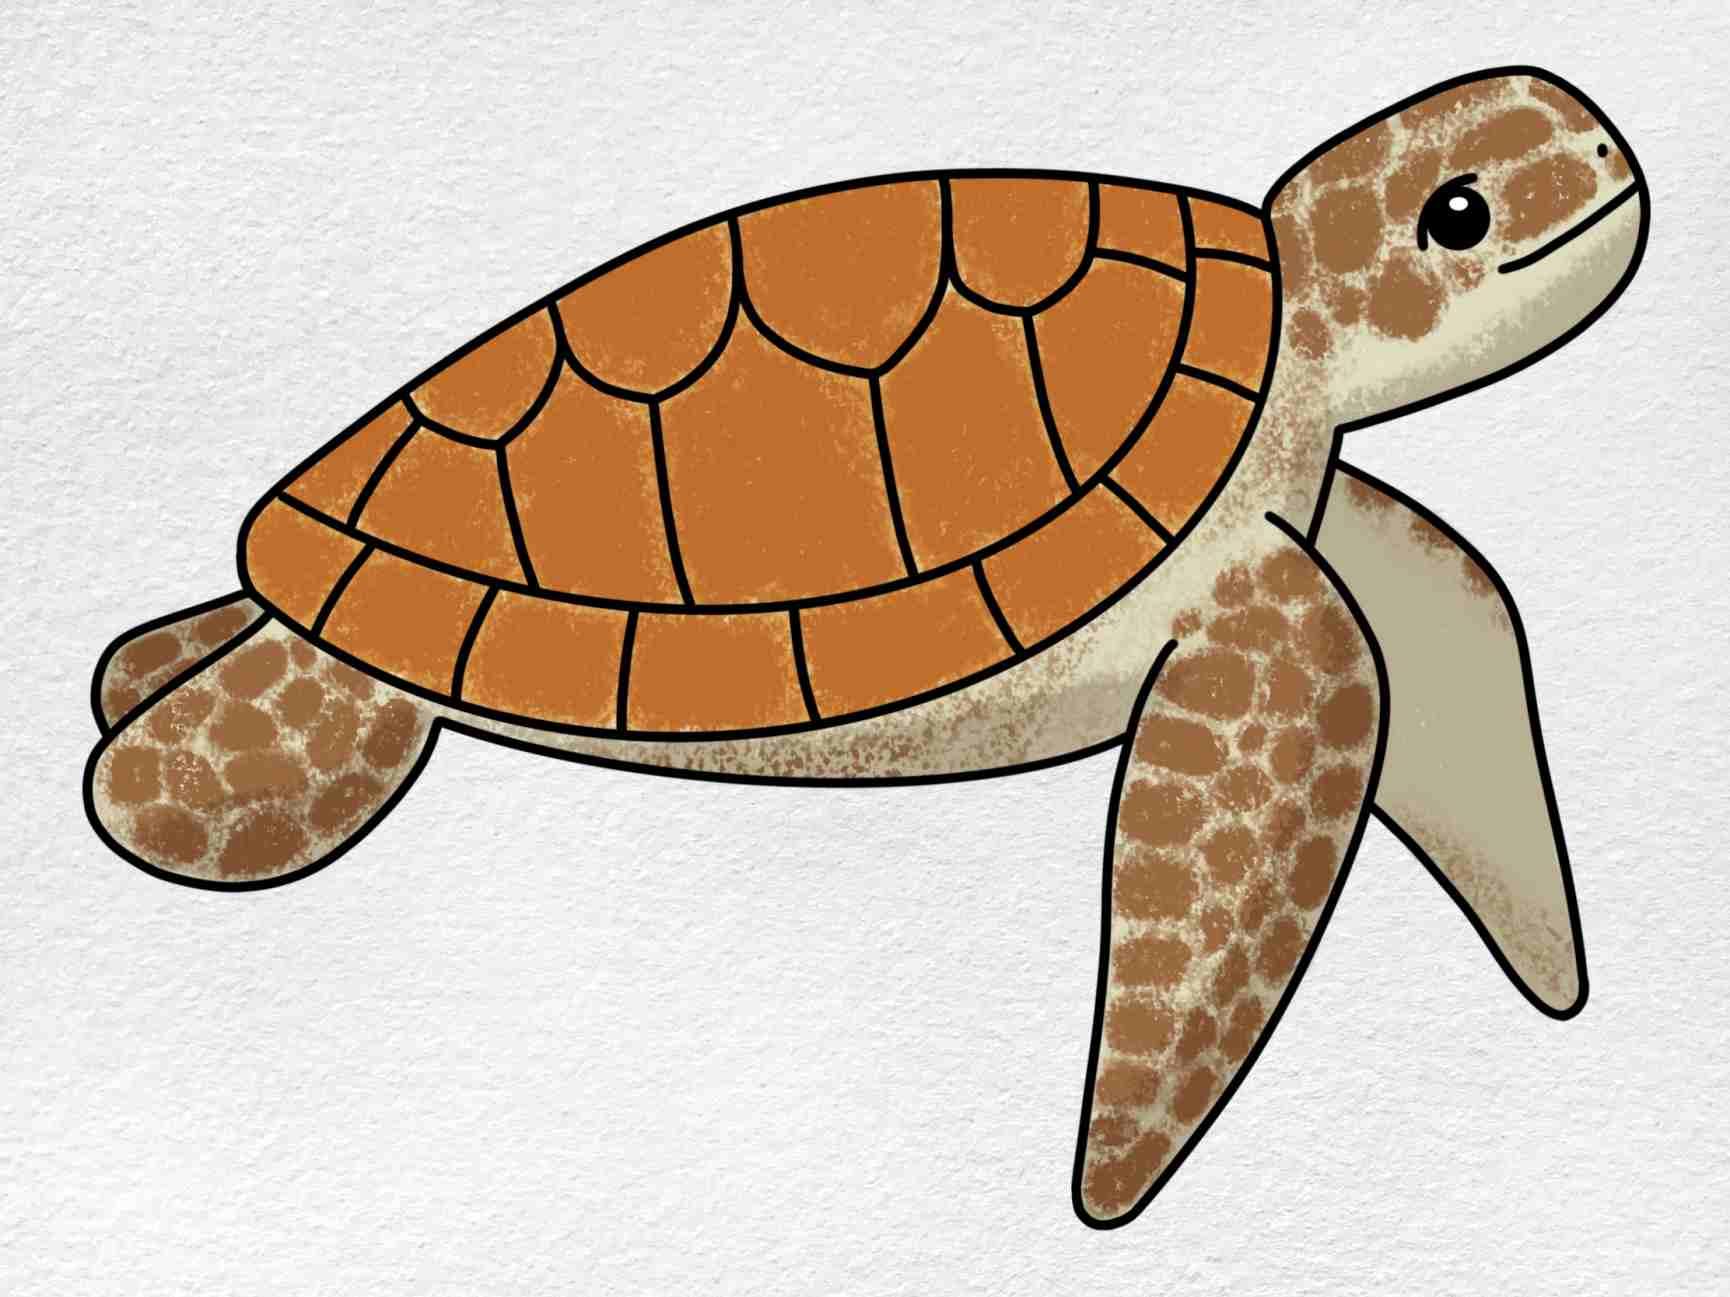 Sea Turtle Drawing Easy: Step 6